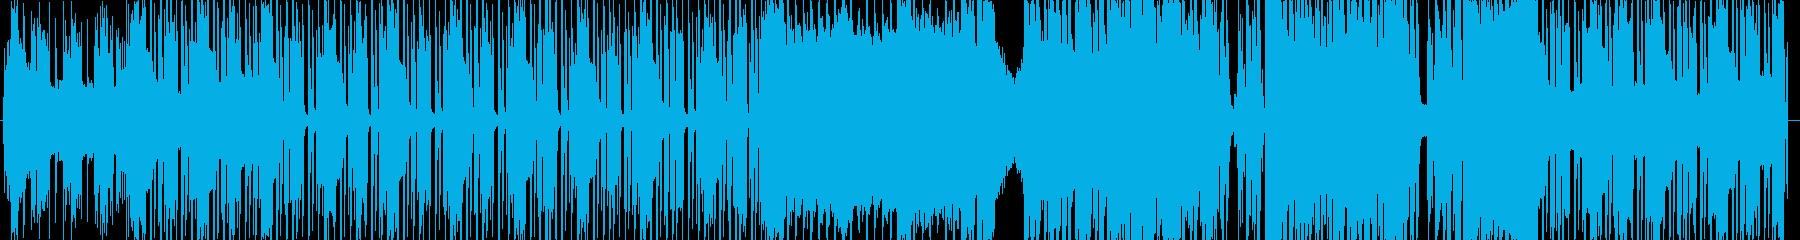 KPOP風ノリの良いピコピコシンセ曲の再生済みの波形